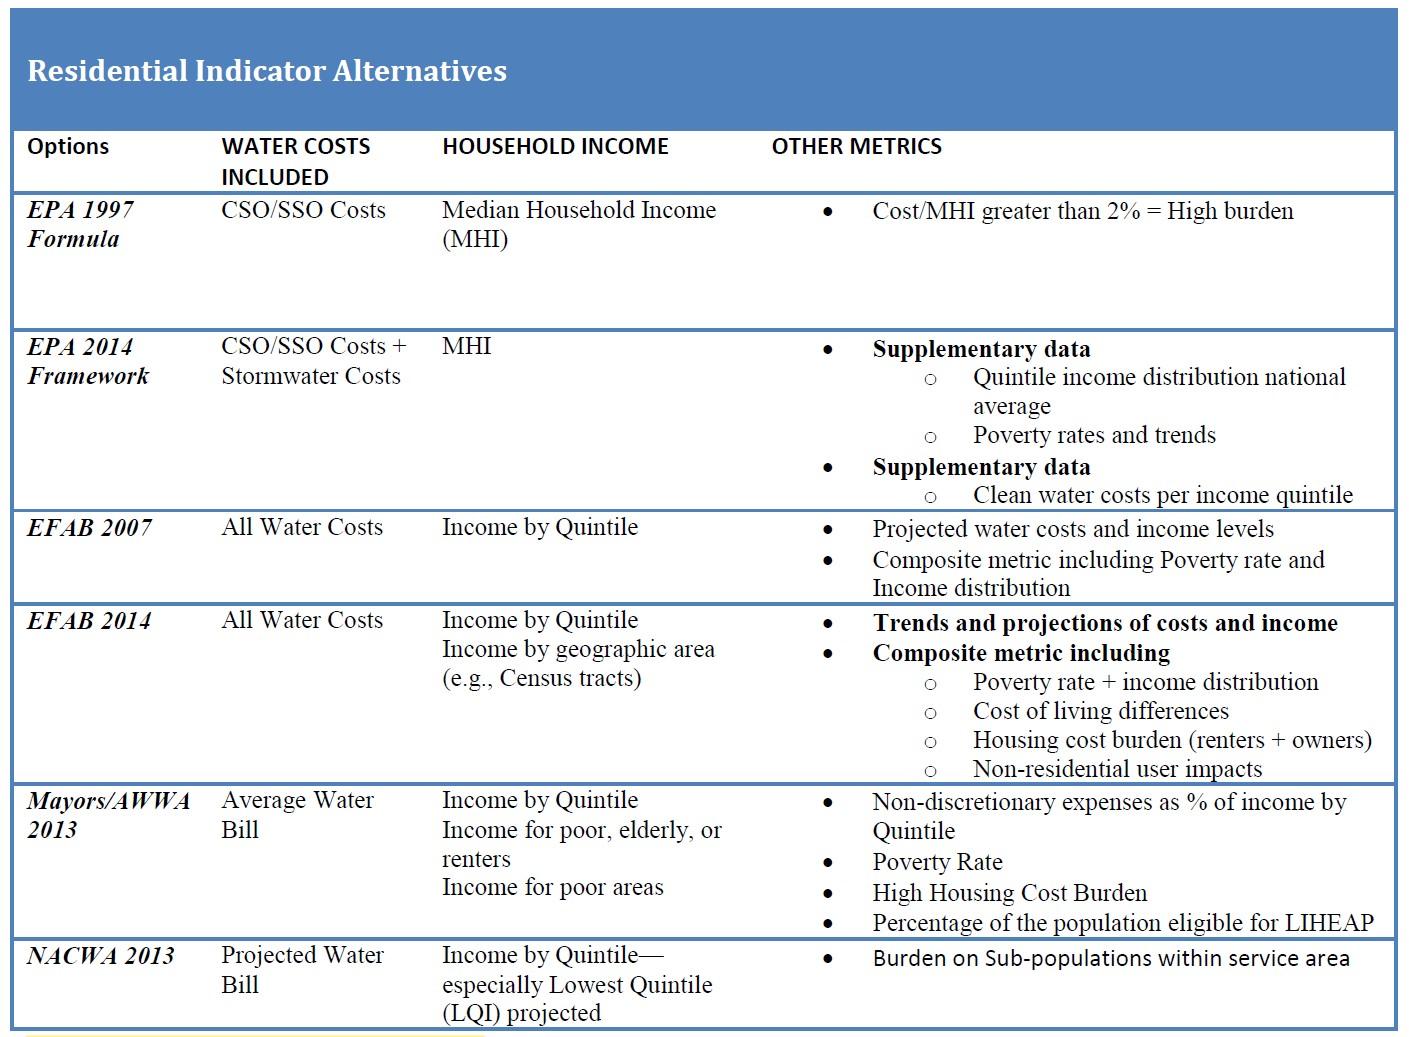 Figure 10: Residential Indicator Metric Alternatives